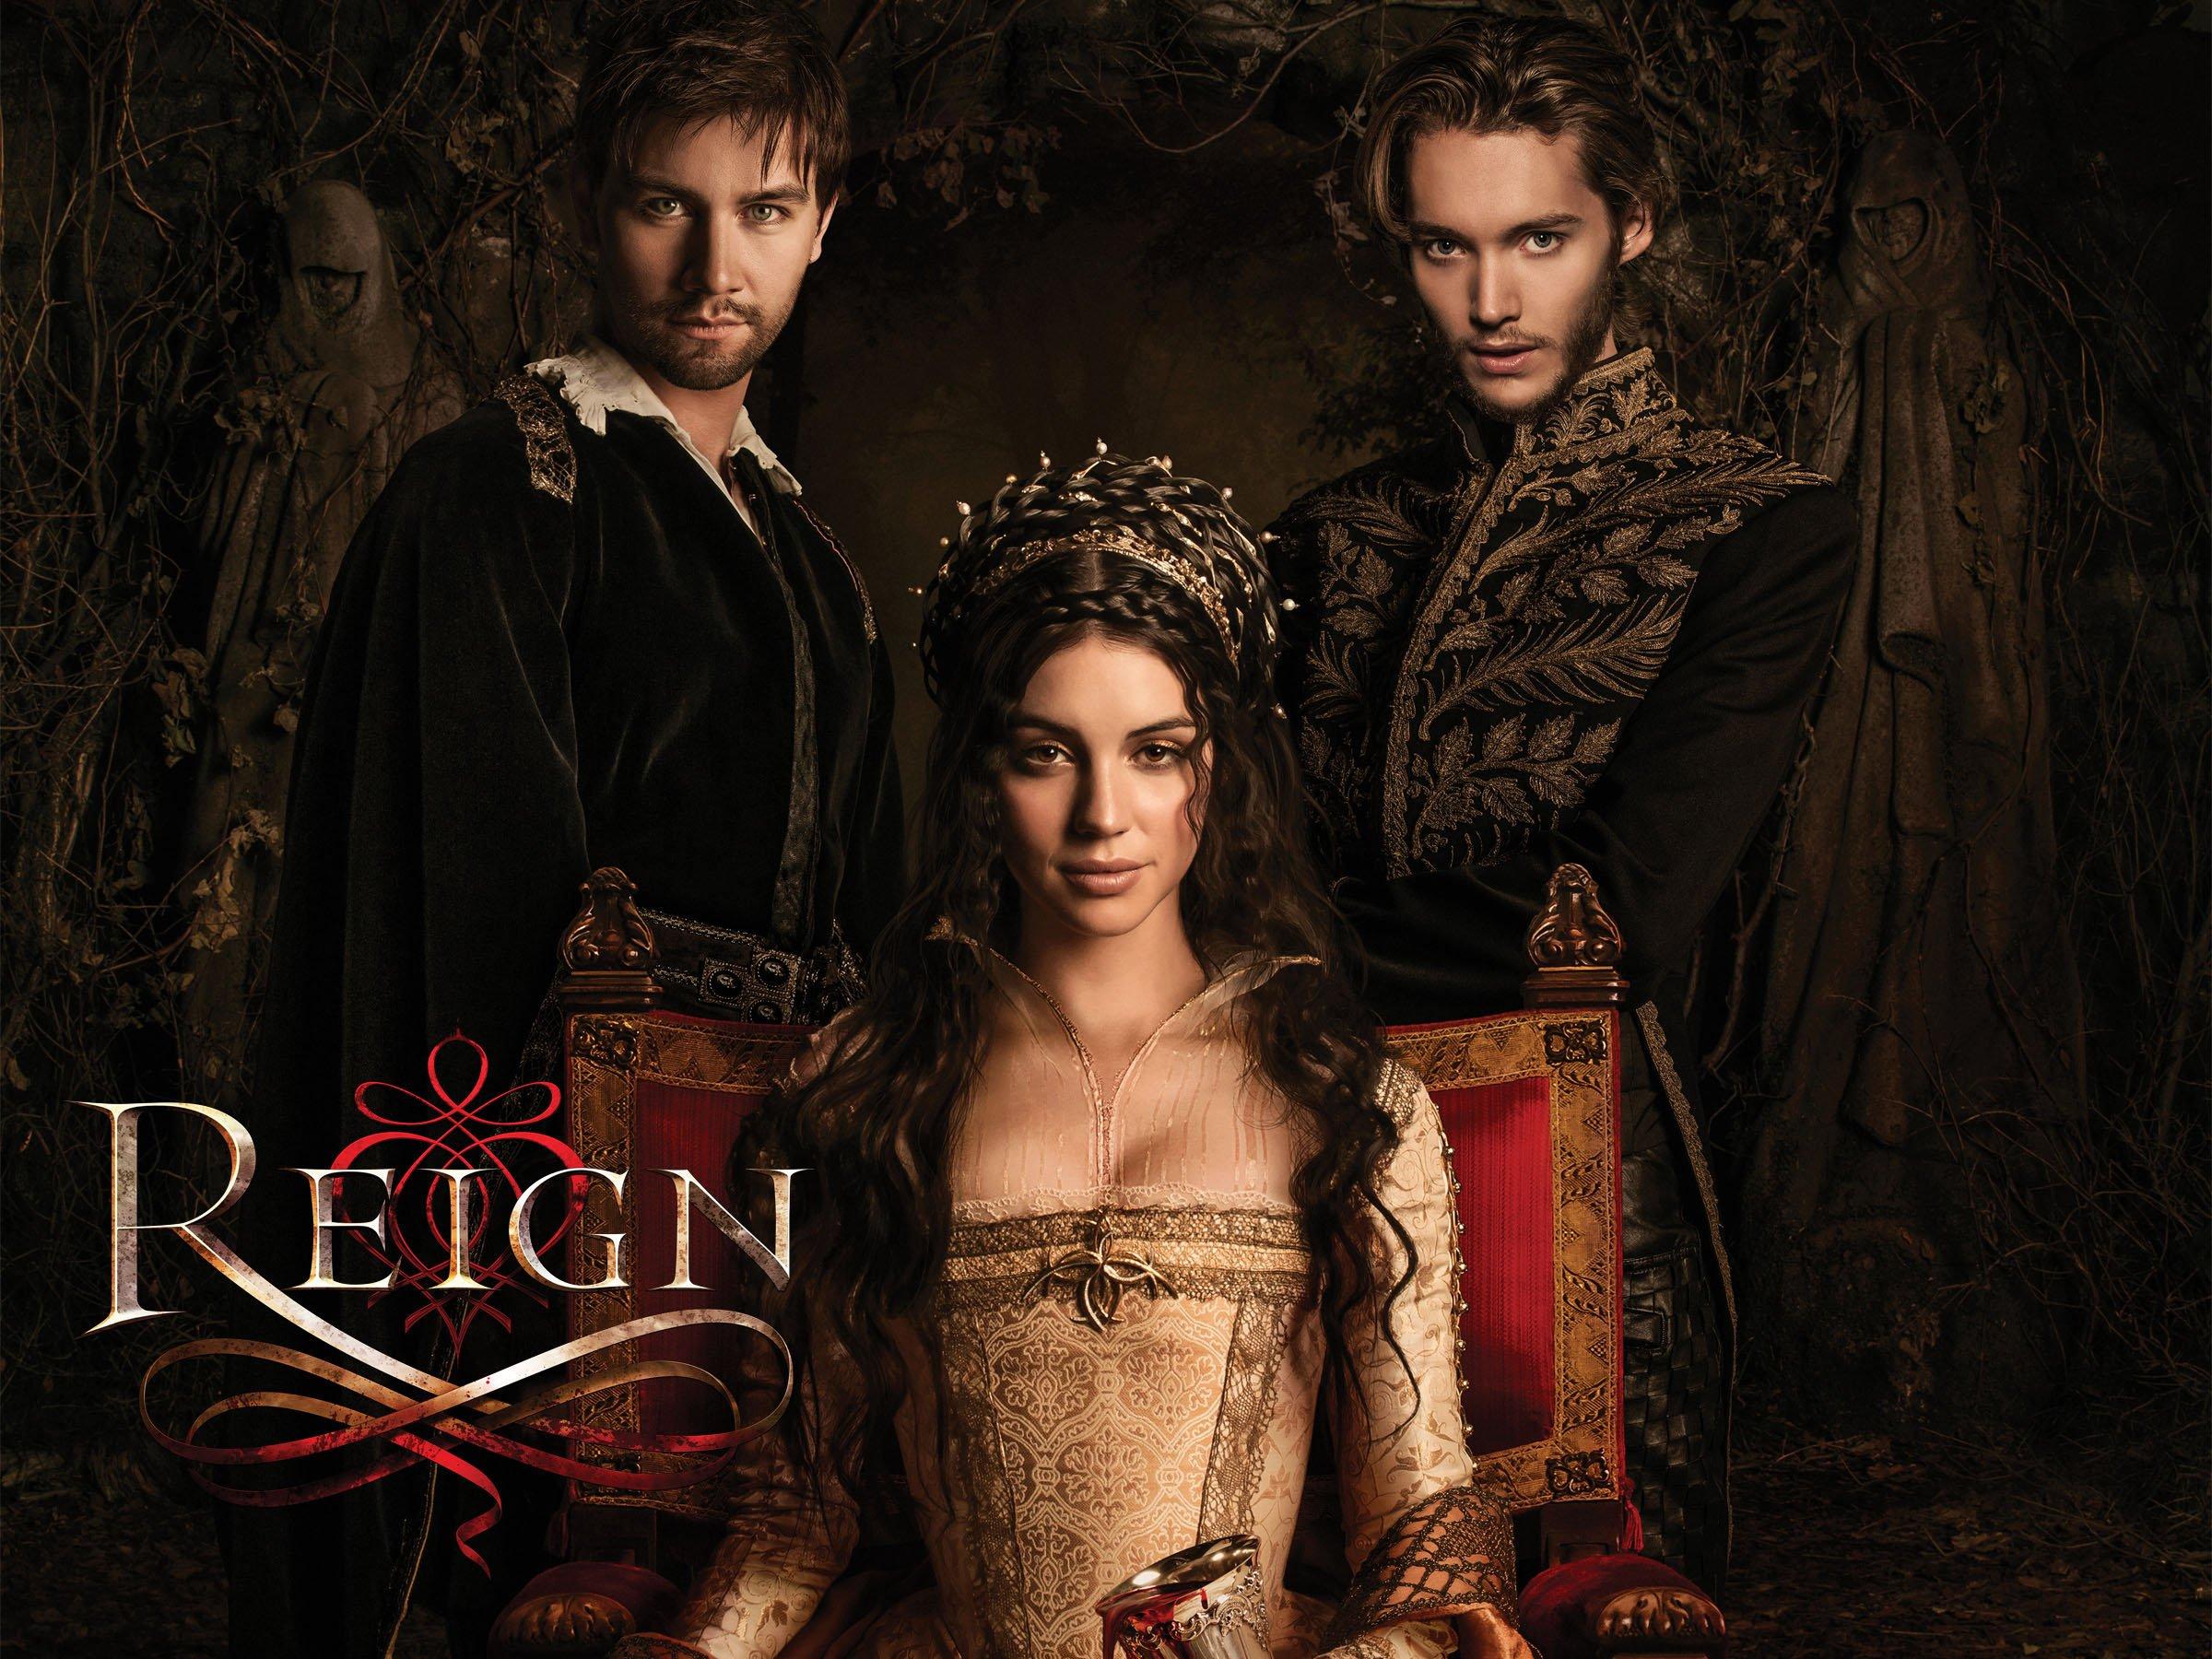 amazon com reign season 1 amazon digital services llc